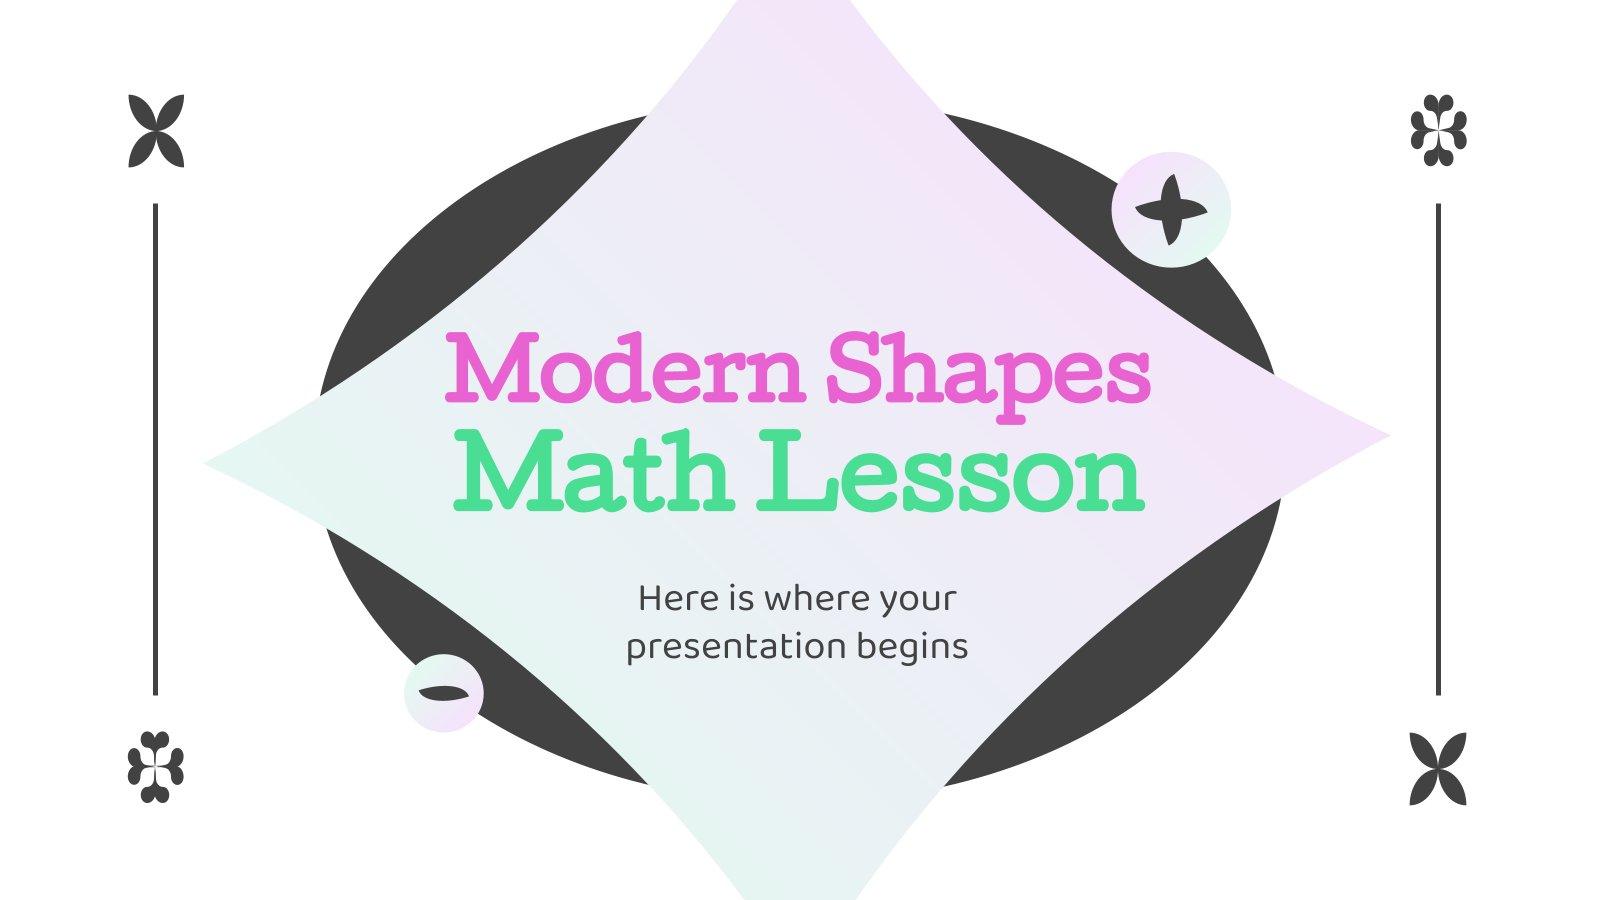 Modern Shapes Math Lesson presentation template